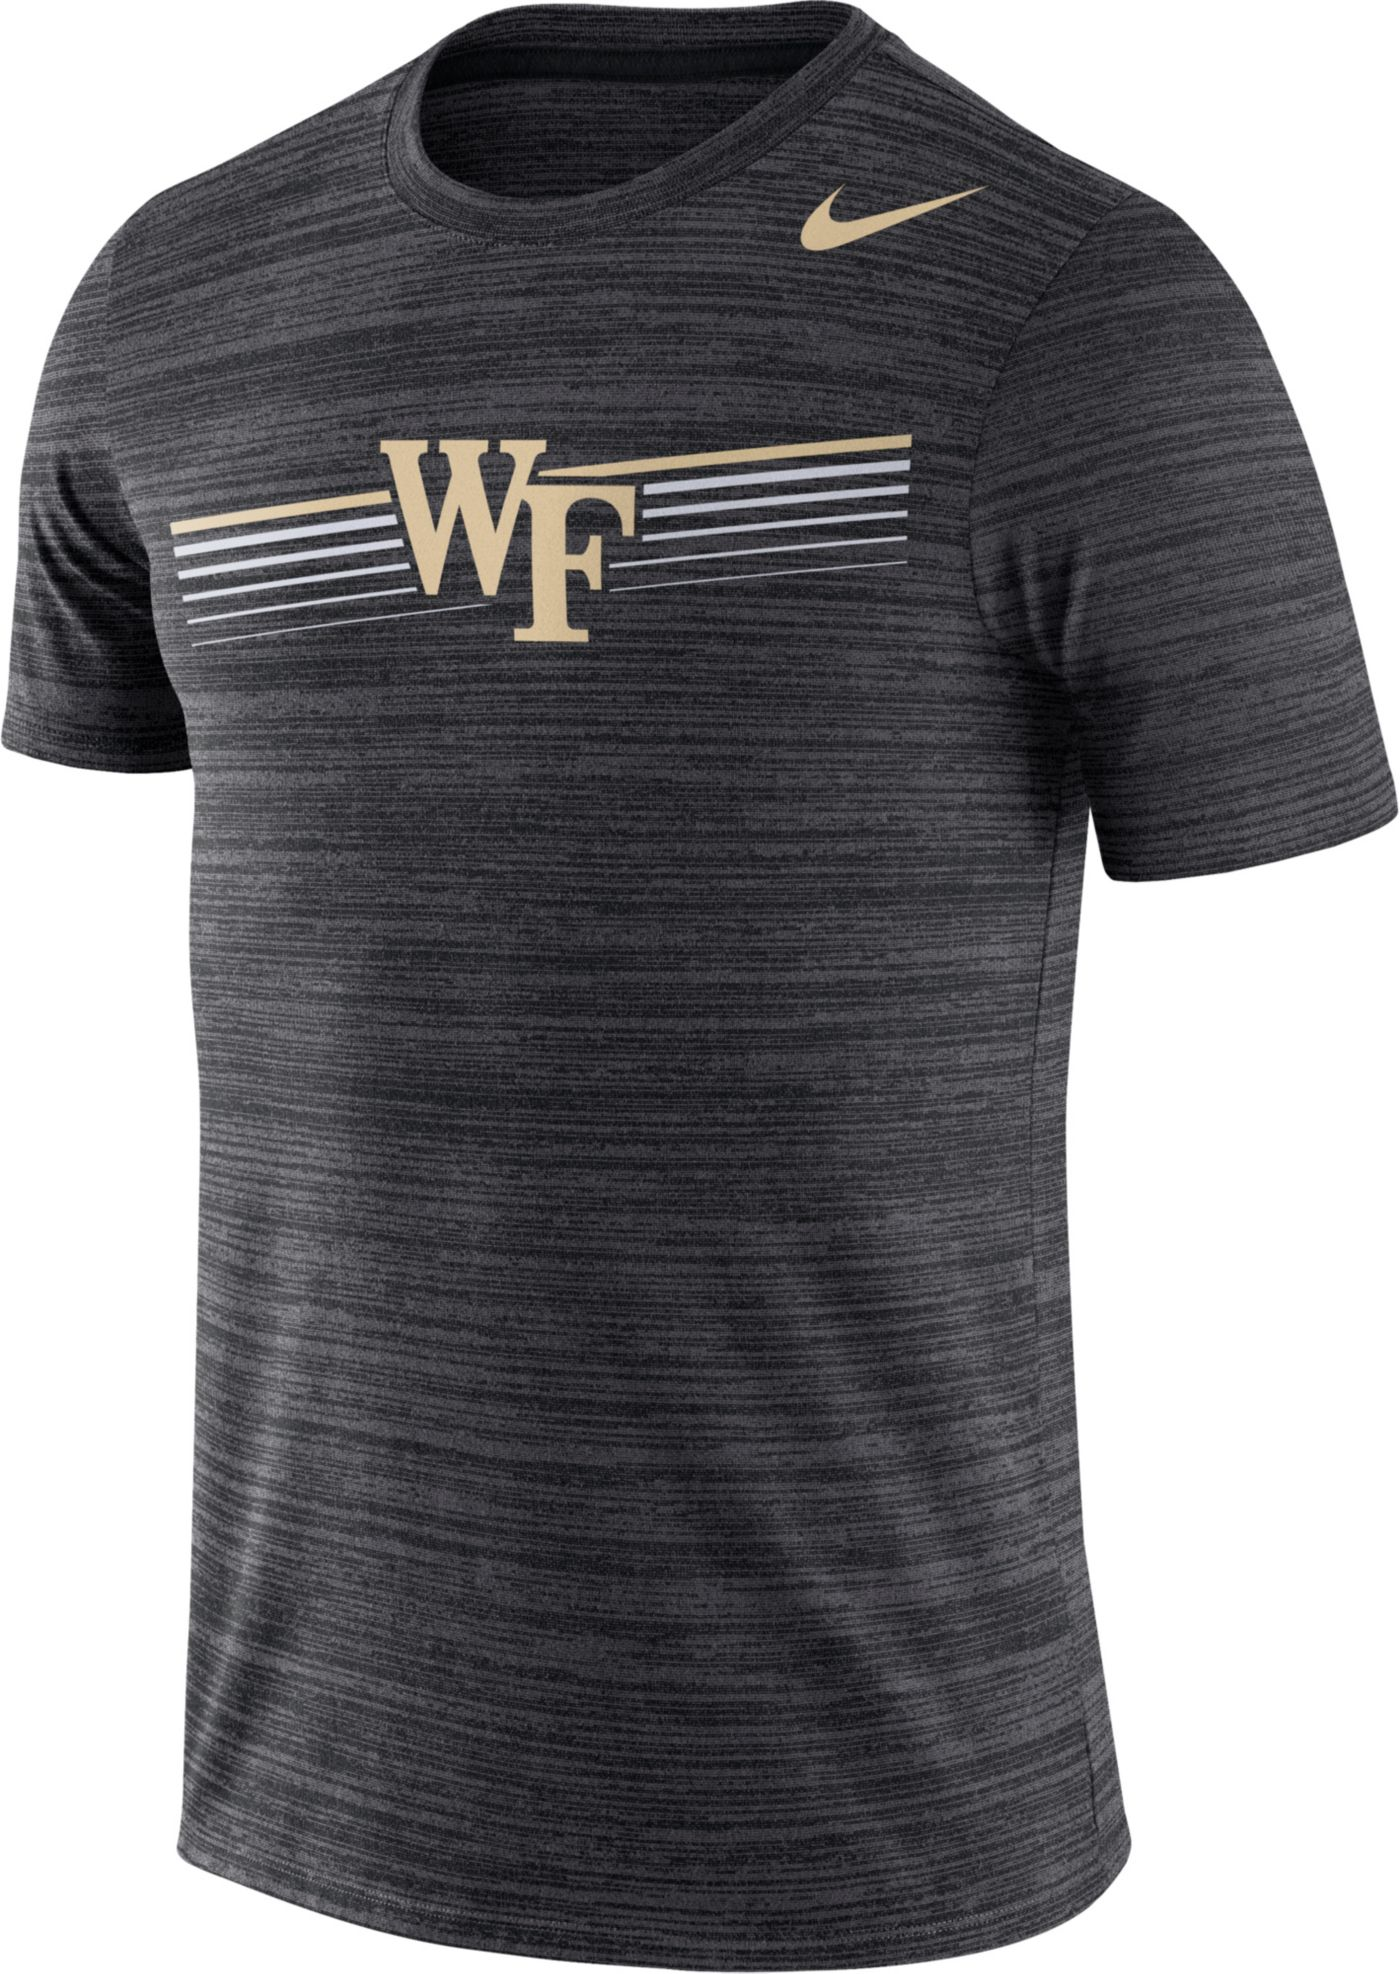 Nike Men's Wake Forest Demon Deacons Velocity Legend Graphic Black T-Shirt